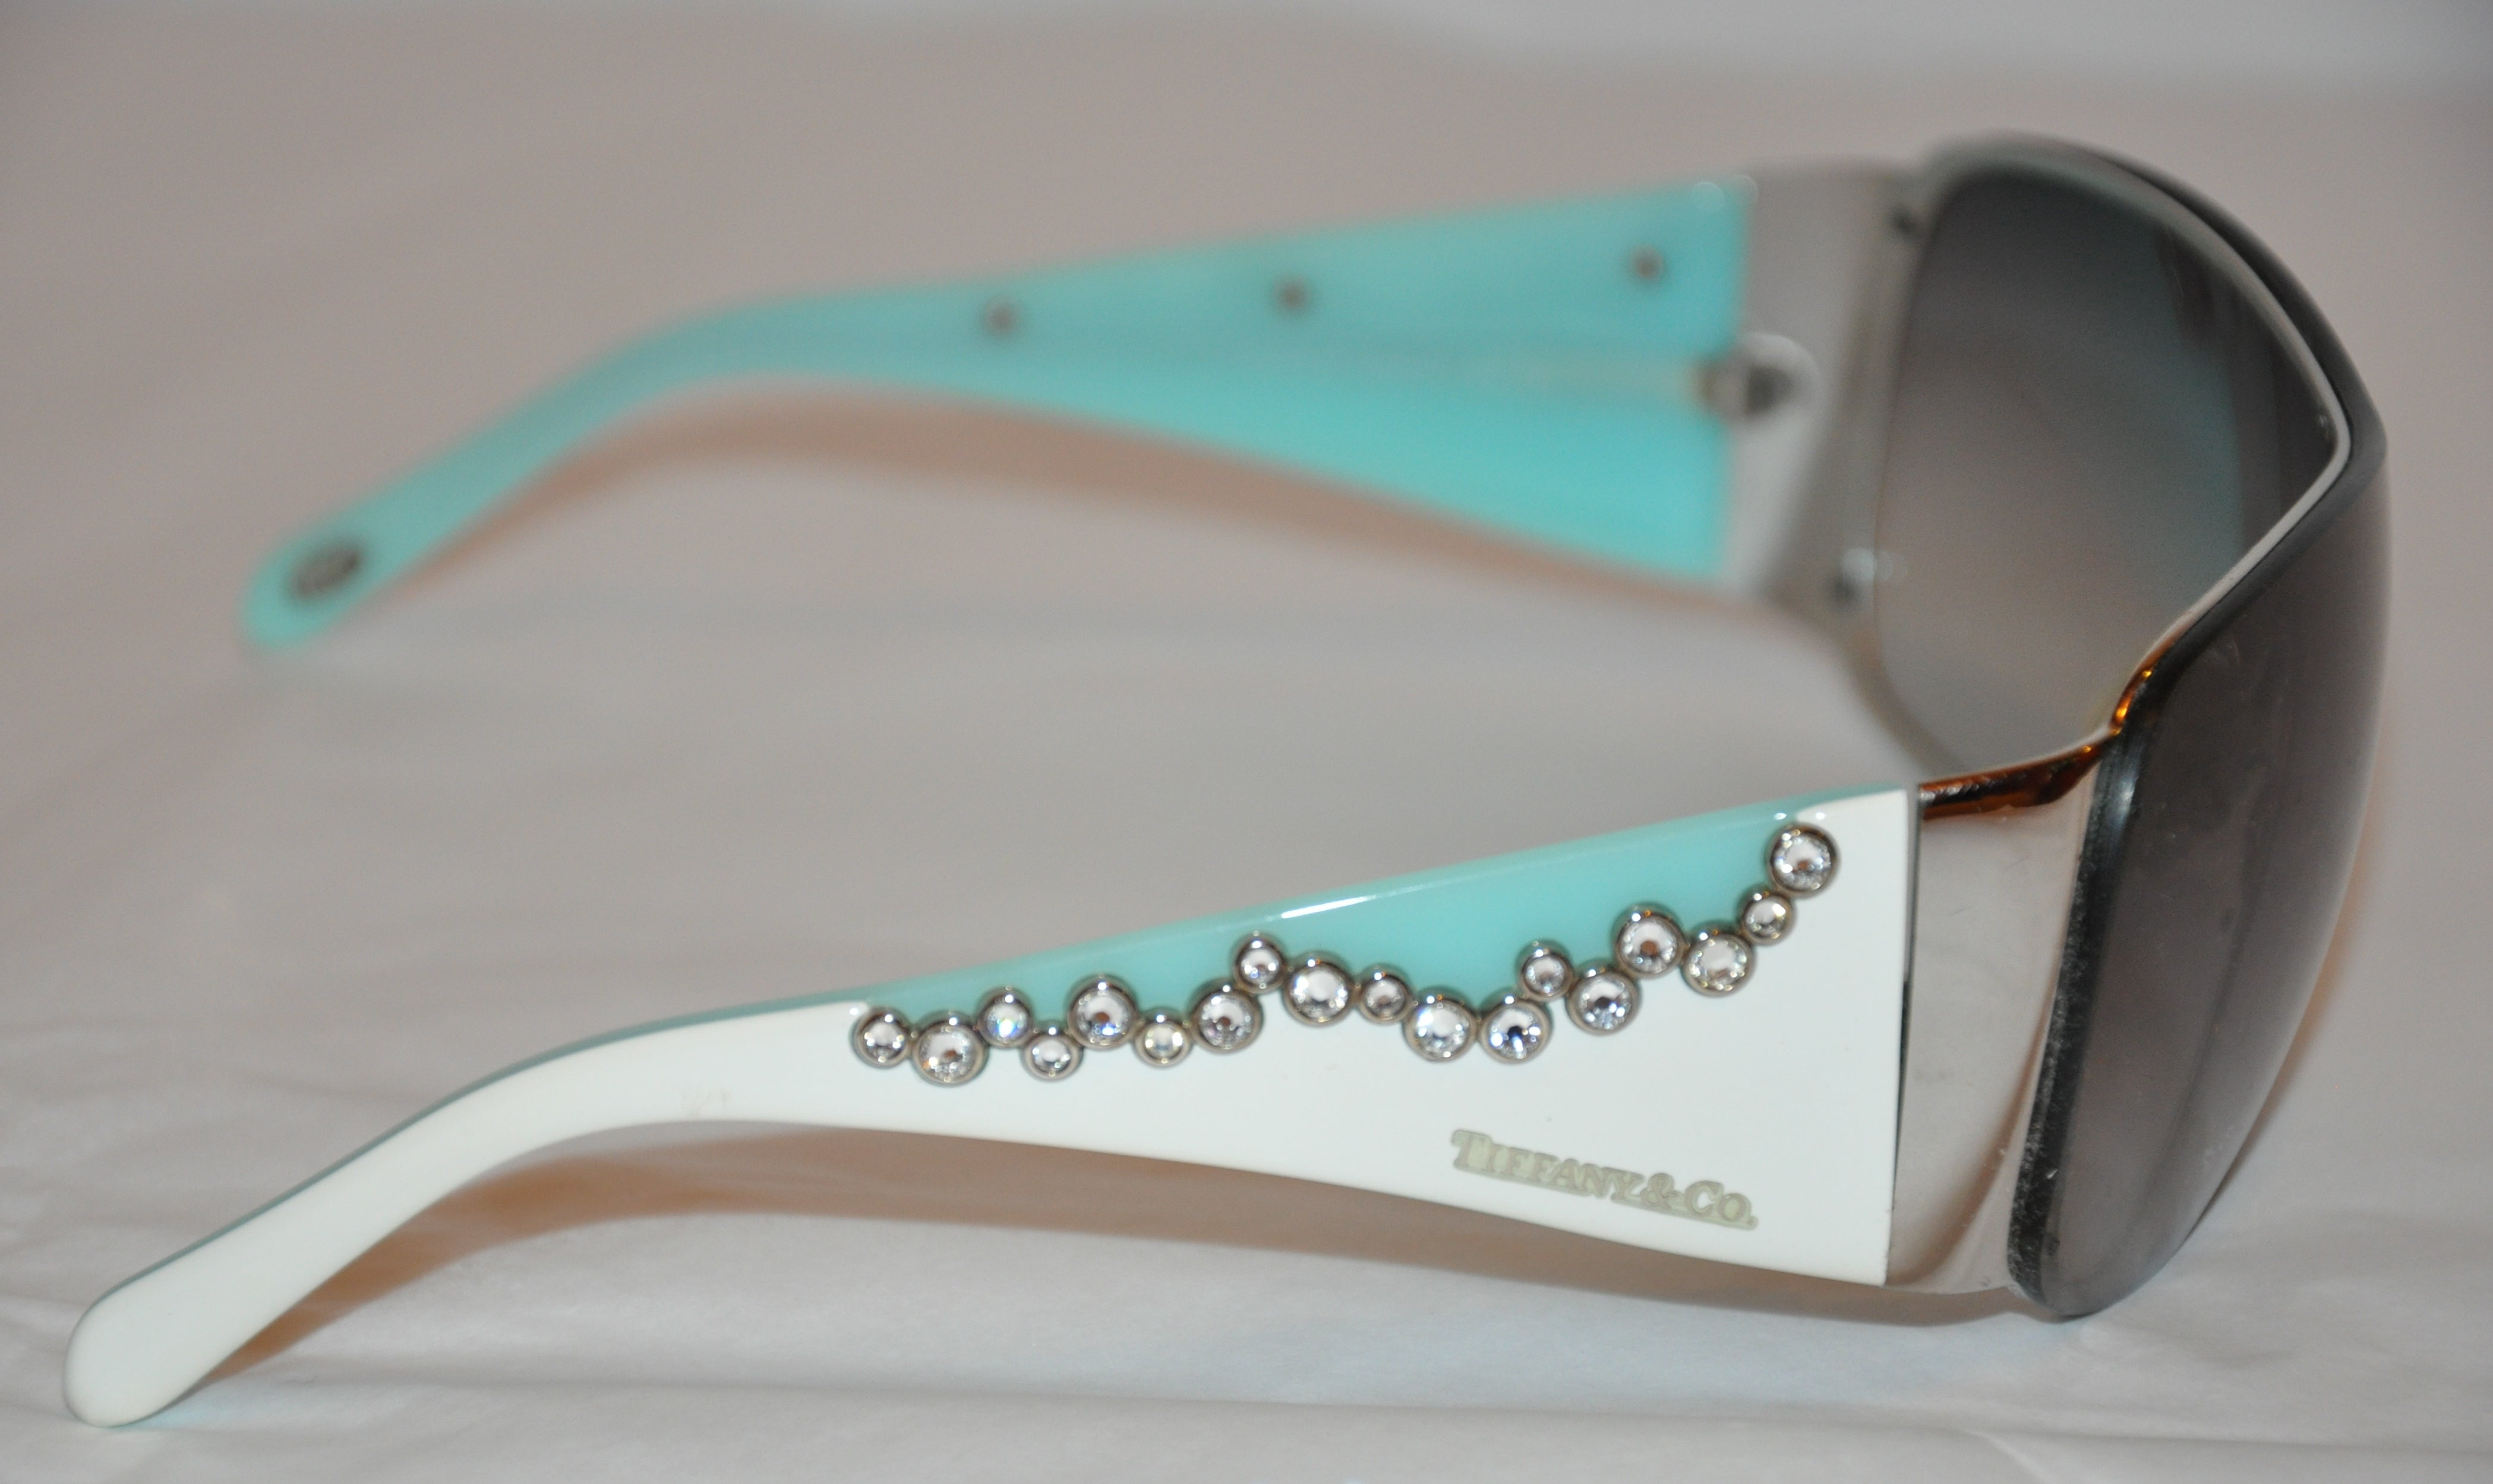 651dd19c50c1 Tiffany and Co Signature Turquoise with Multi-Rhinestones Huge Sunglasses  at 1stdibs